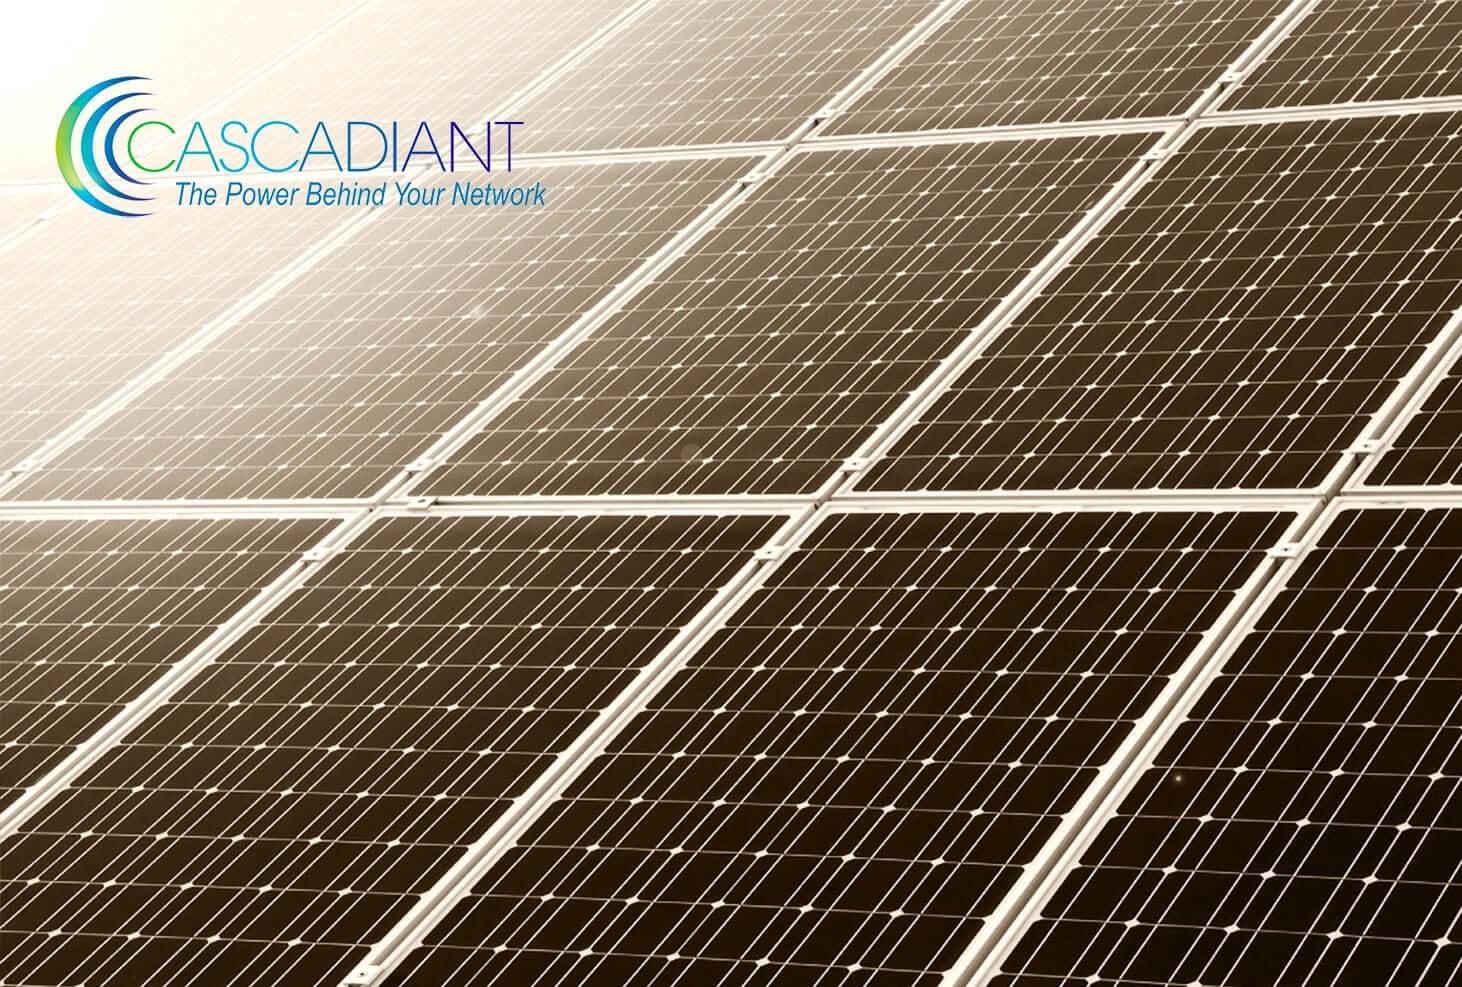 Solar panels with Cascadiant logo